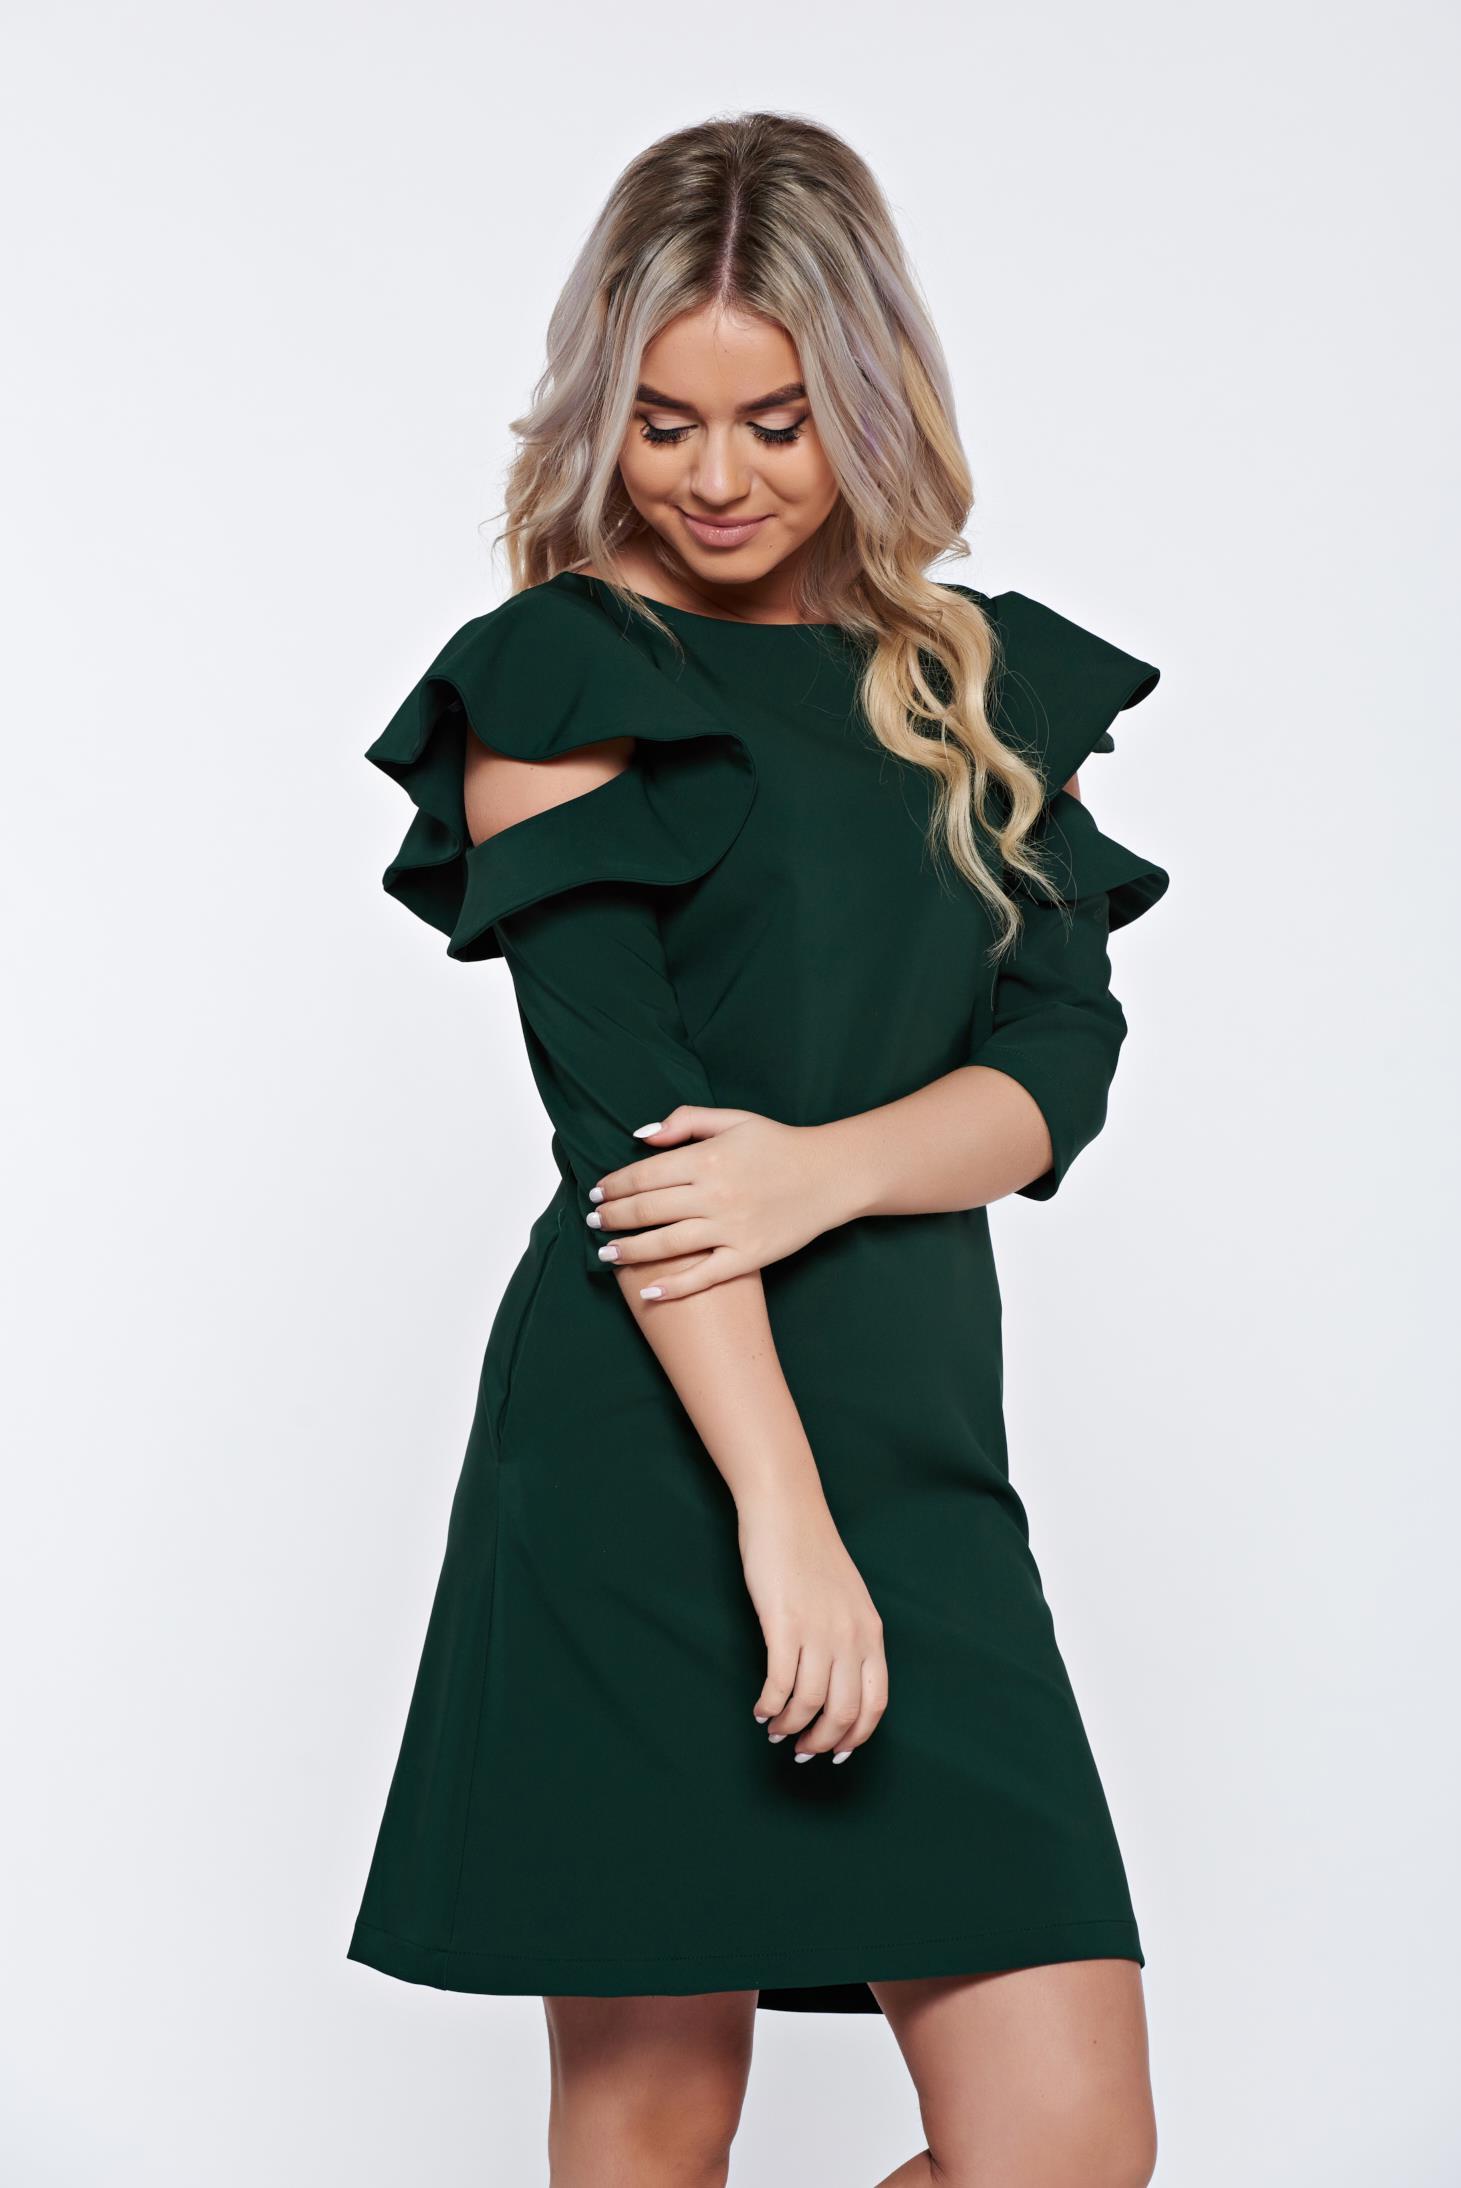 Rochie LaDonna verde-inchis cu croi larg din stofa usor elastica cu volanase la maneca